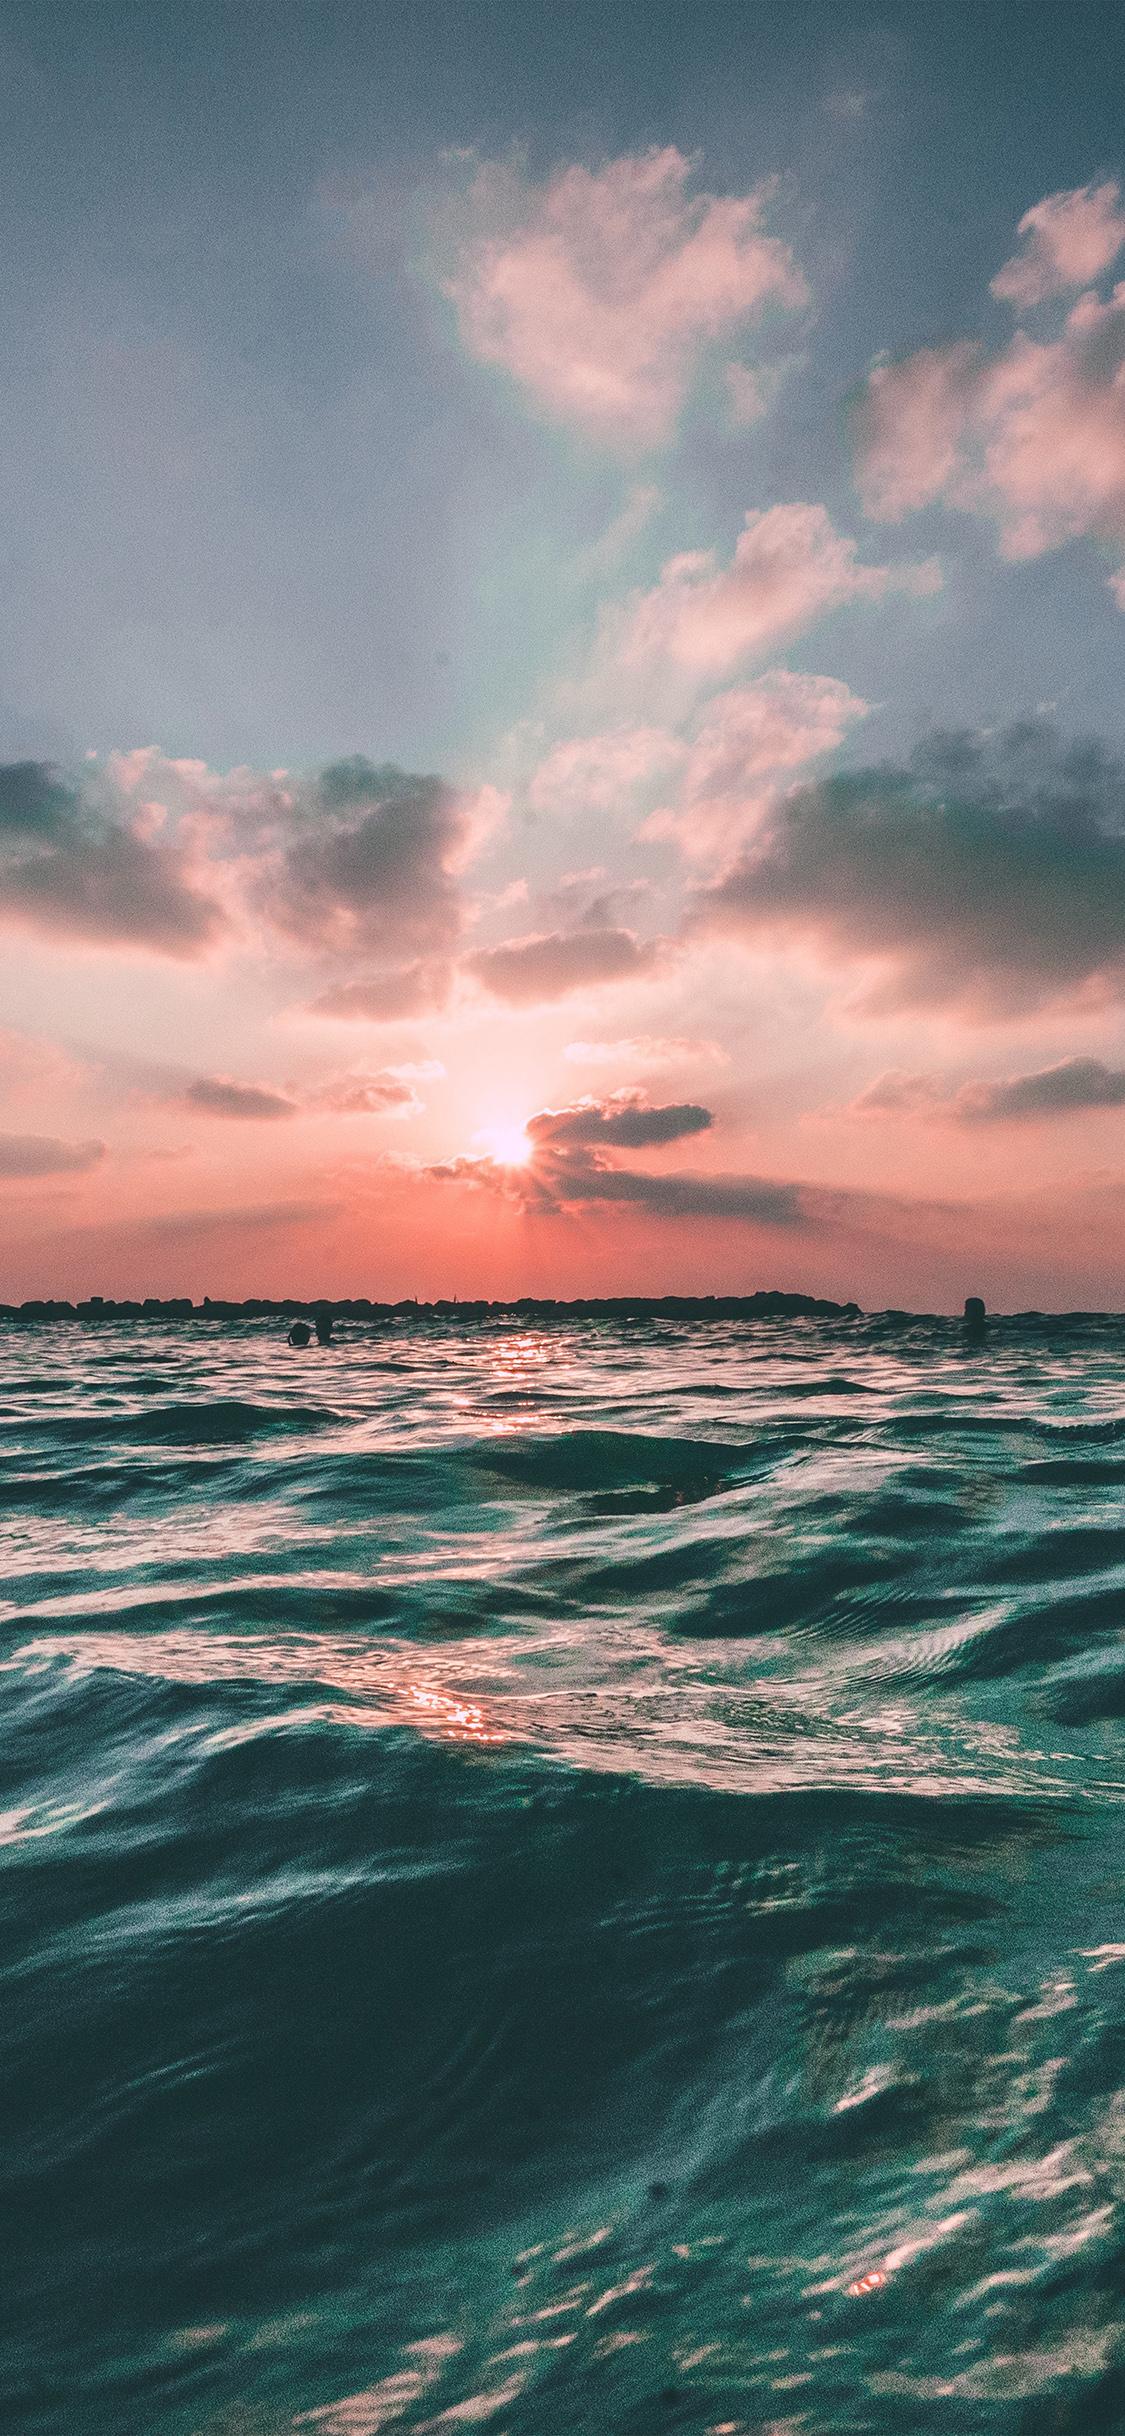 Wallpaper Iphone Pastel Nf43 Sunset Sea Sky Ocean Summer Green Water Nature Wallpaper